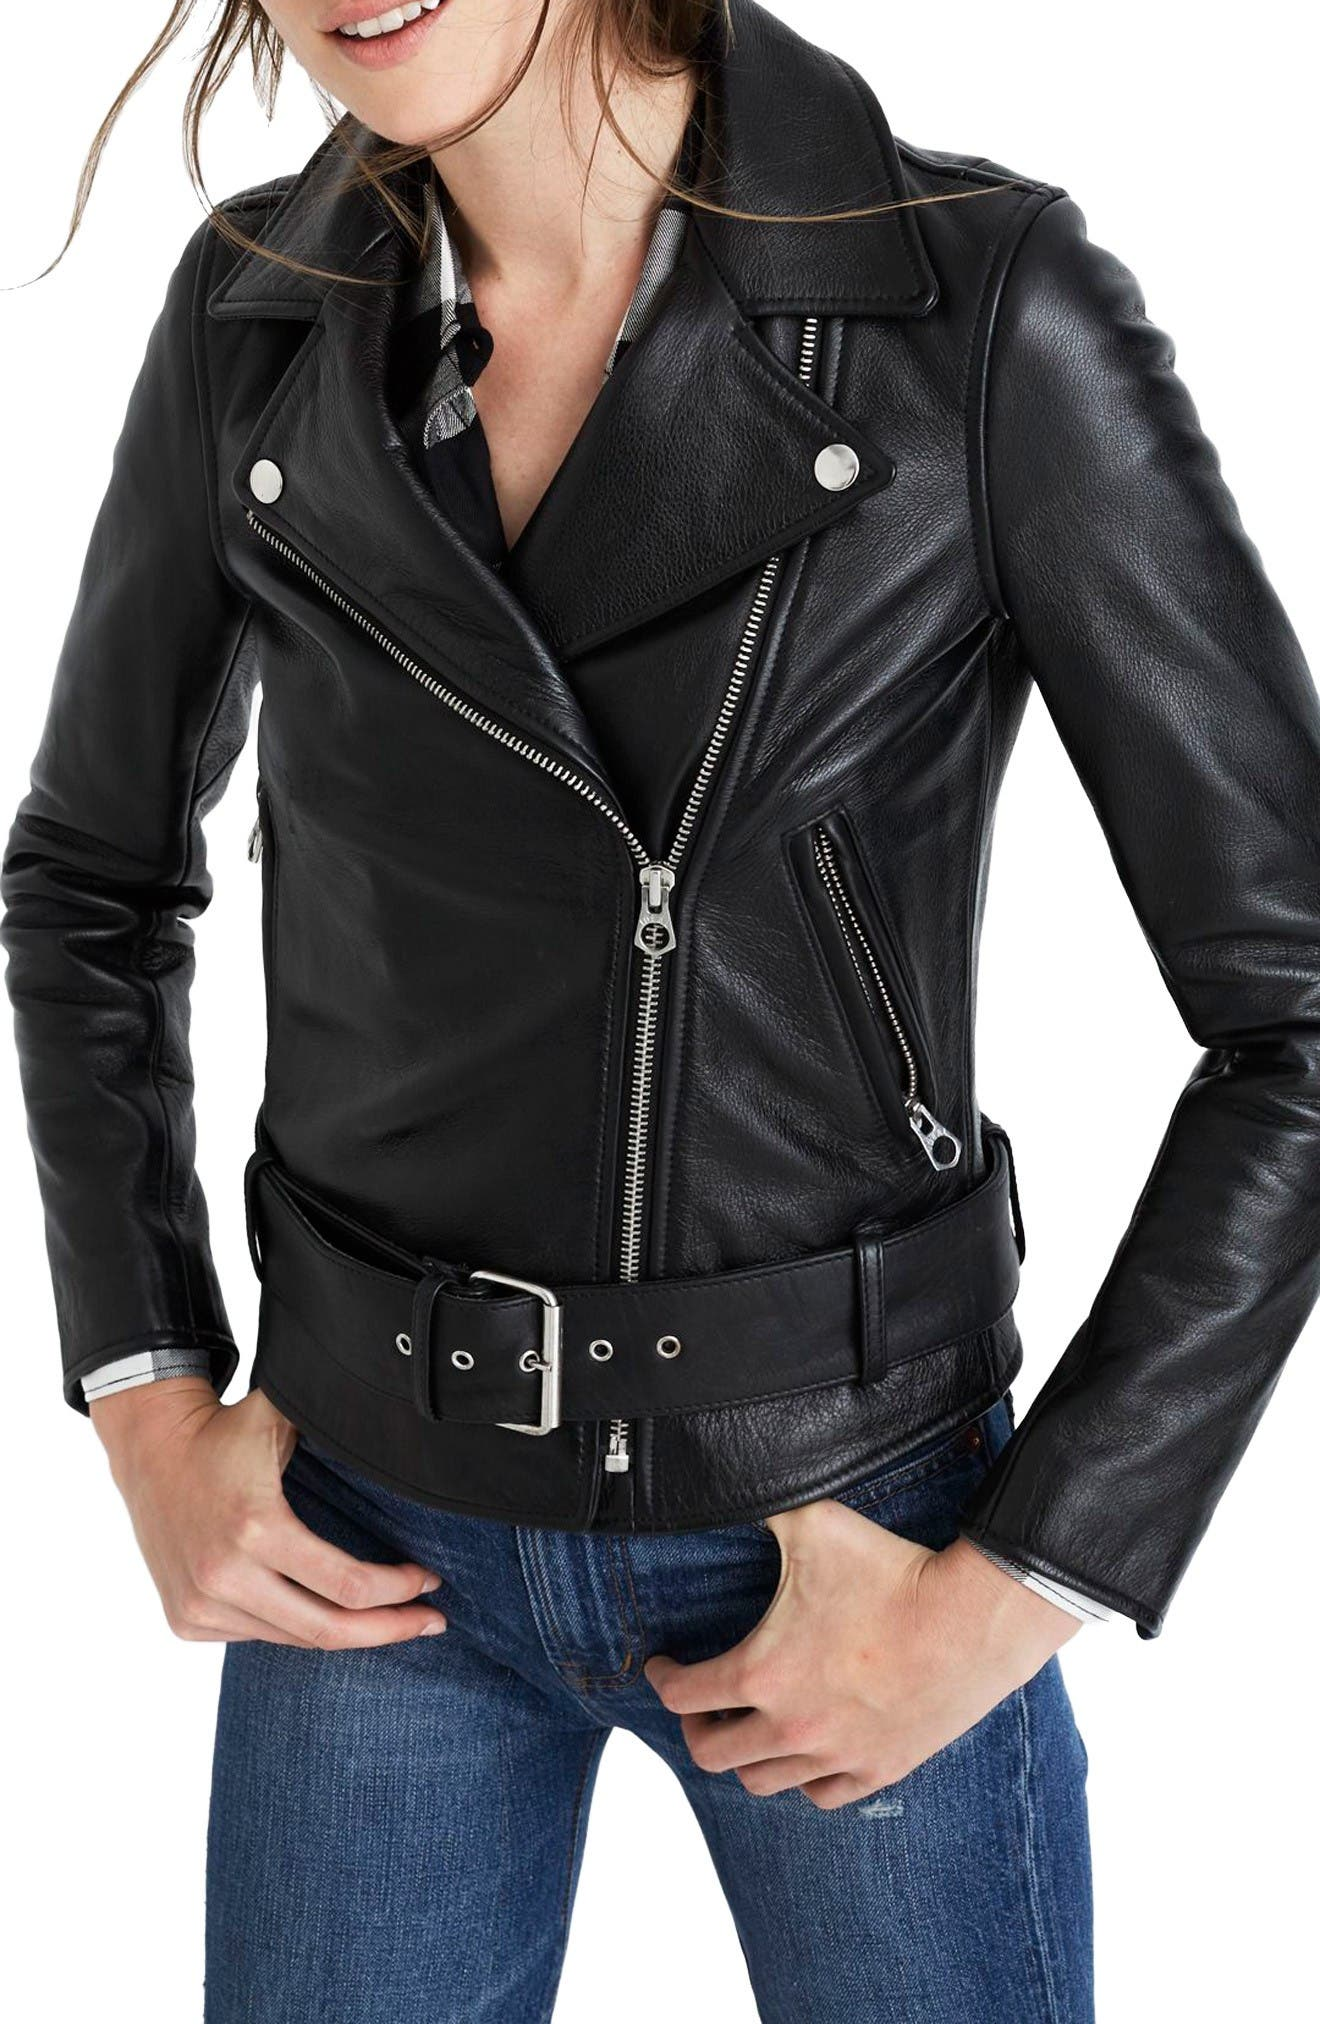 Ultimate Leather Jacket,                             Main thumbnail 1, color,                             True Black